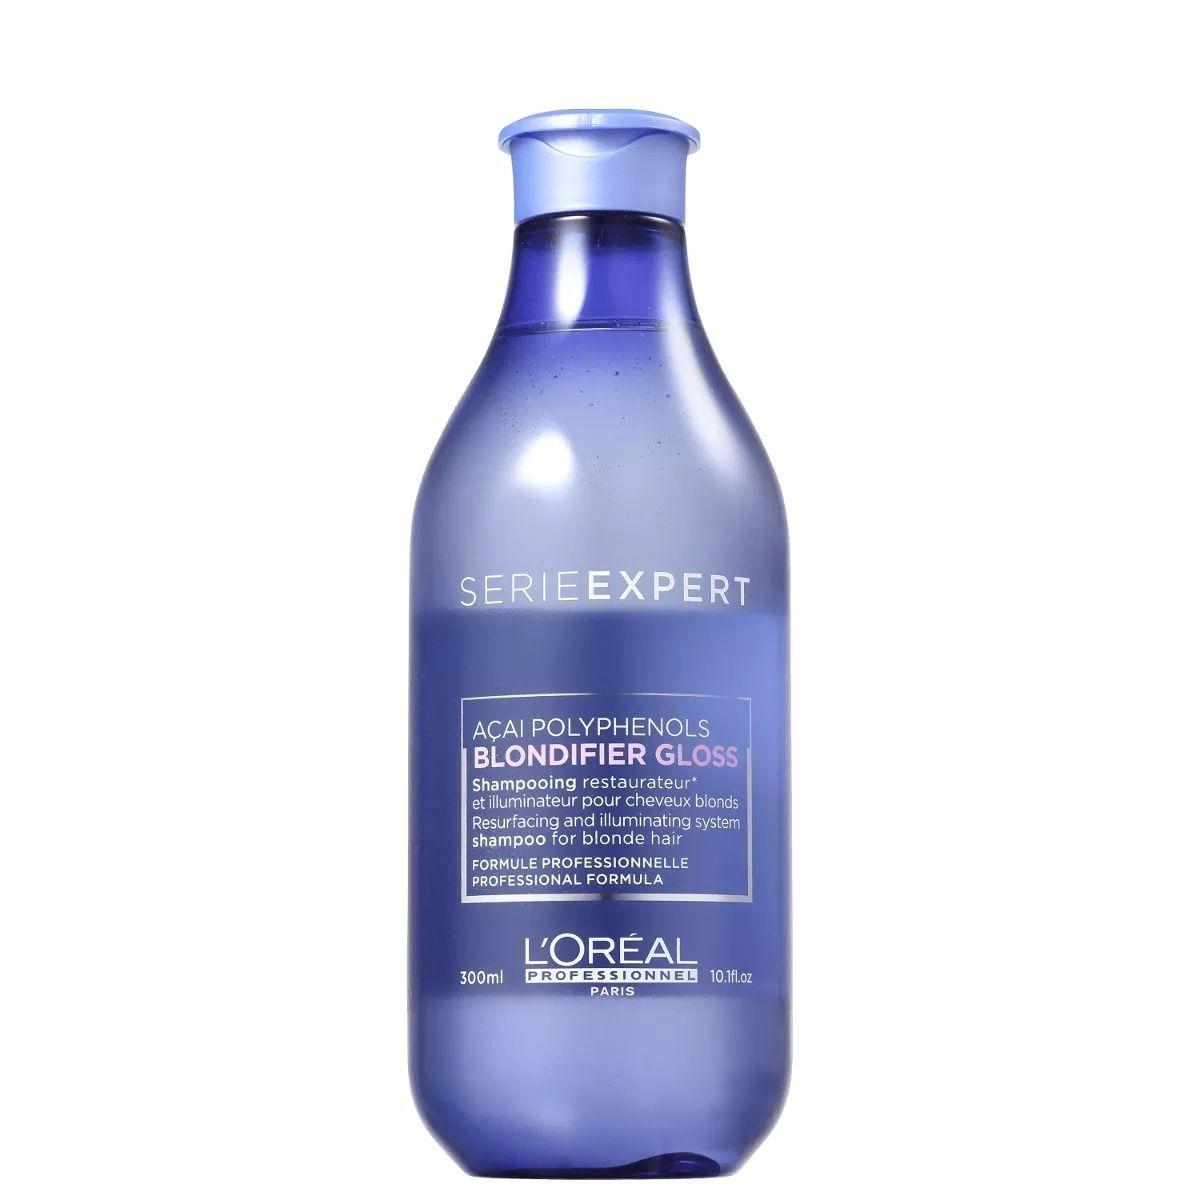 Kit Loreal Expert Blondifier Gloss